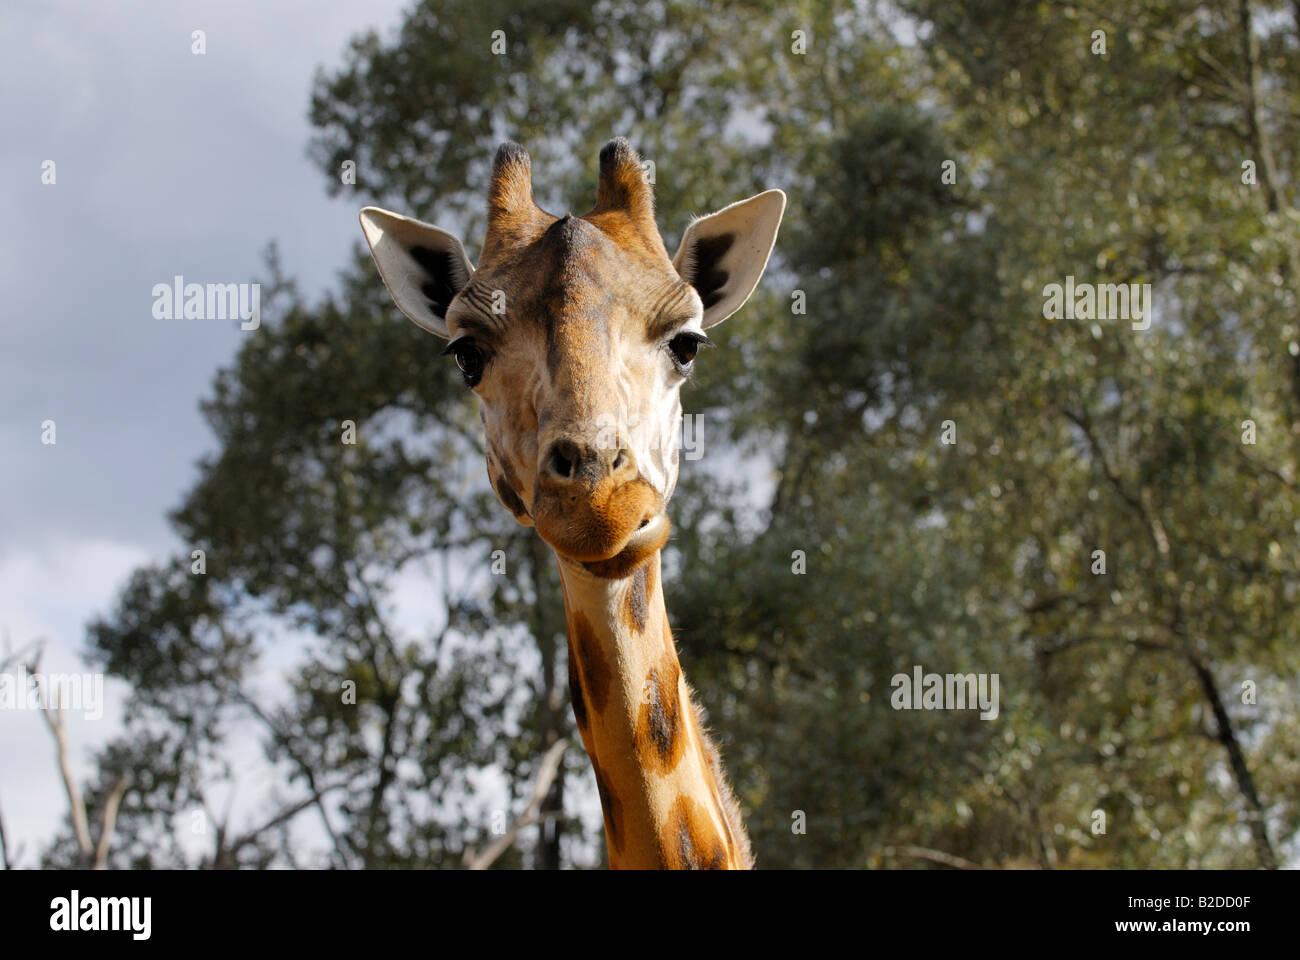 Rothschild giraf GIRAFFA CAMELOPARDALIS ROTHSCHILDI the Giraffe Manor NAIROBI KENYA Africa - Stock Image